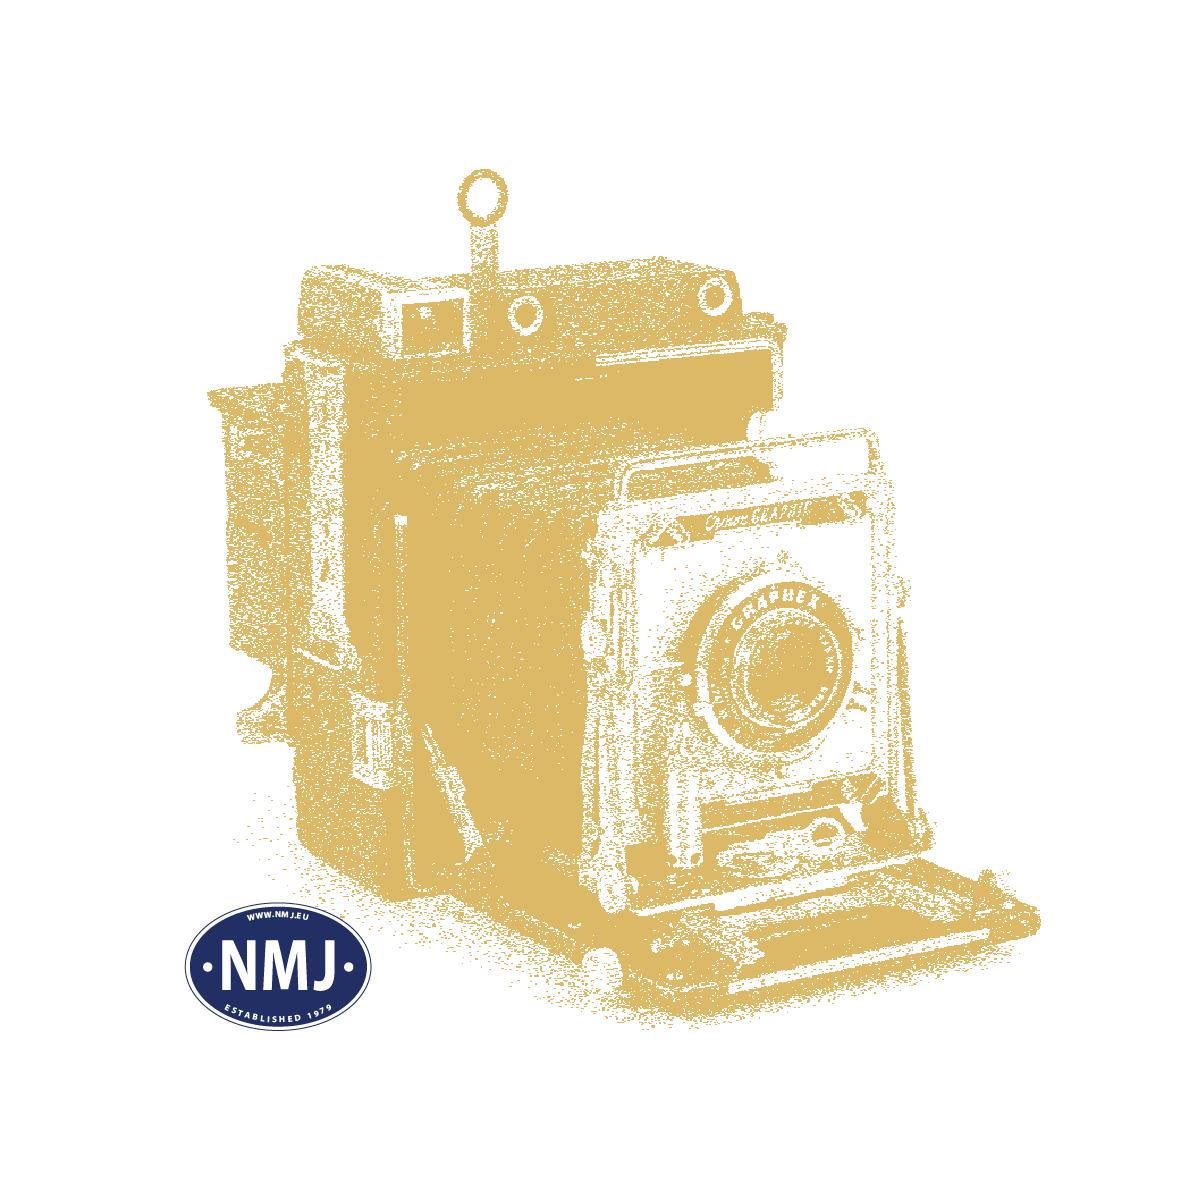 FAL170861 - Profi Dekorplate, Naturstein, H0